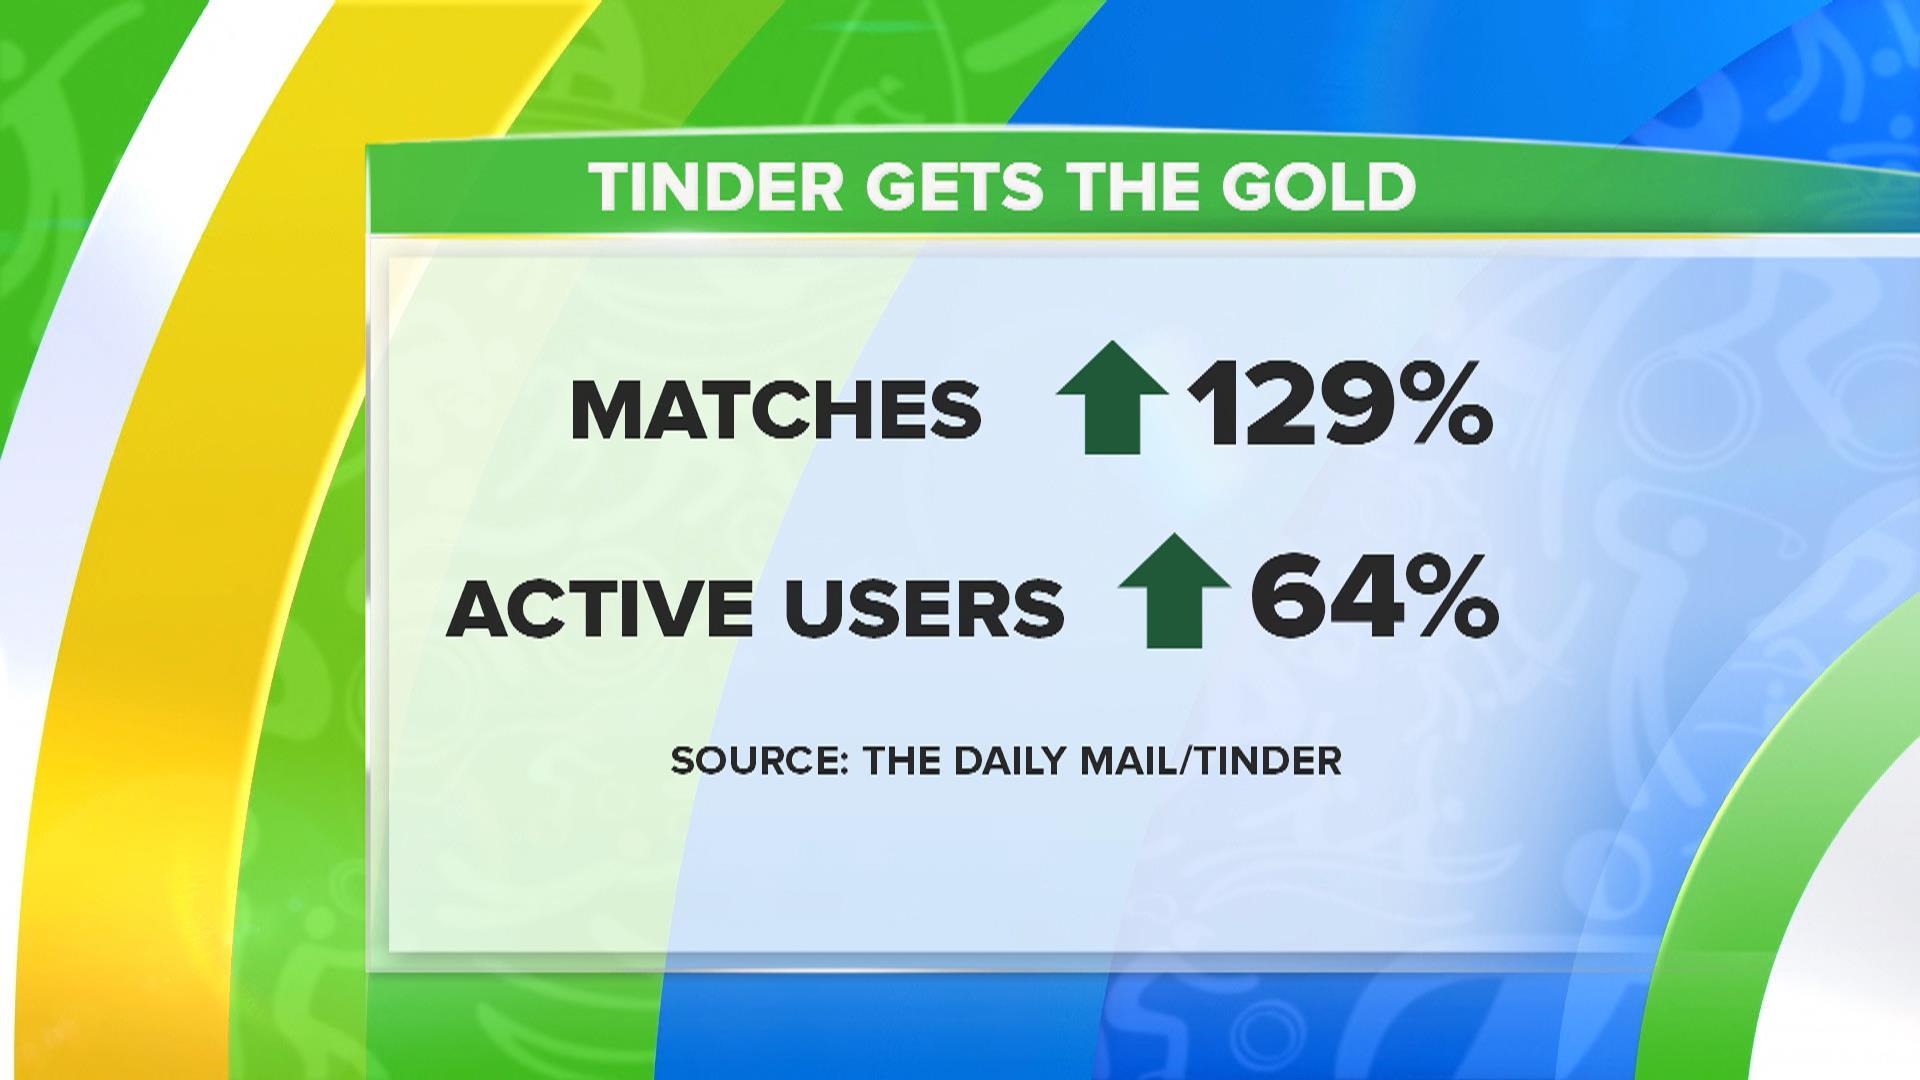 dating sites bedre end match.com